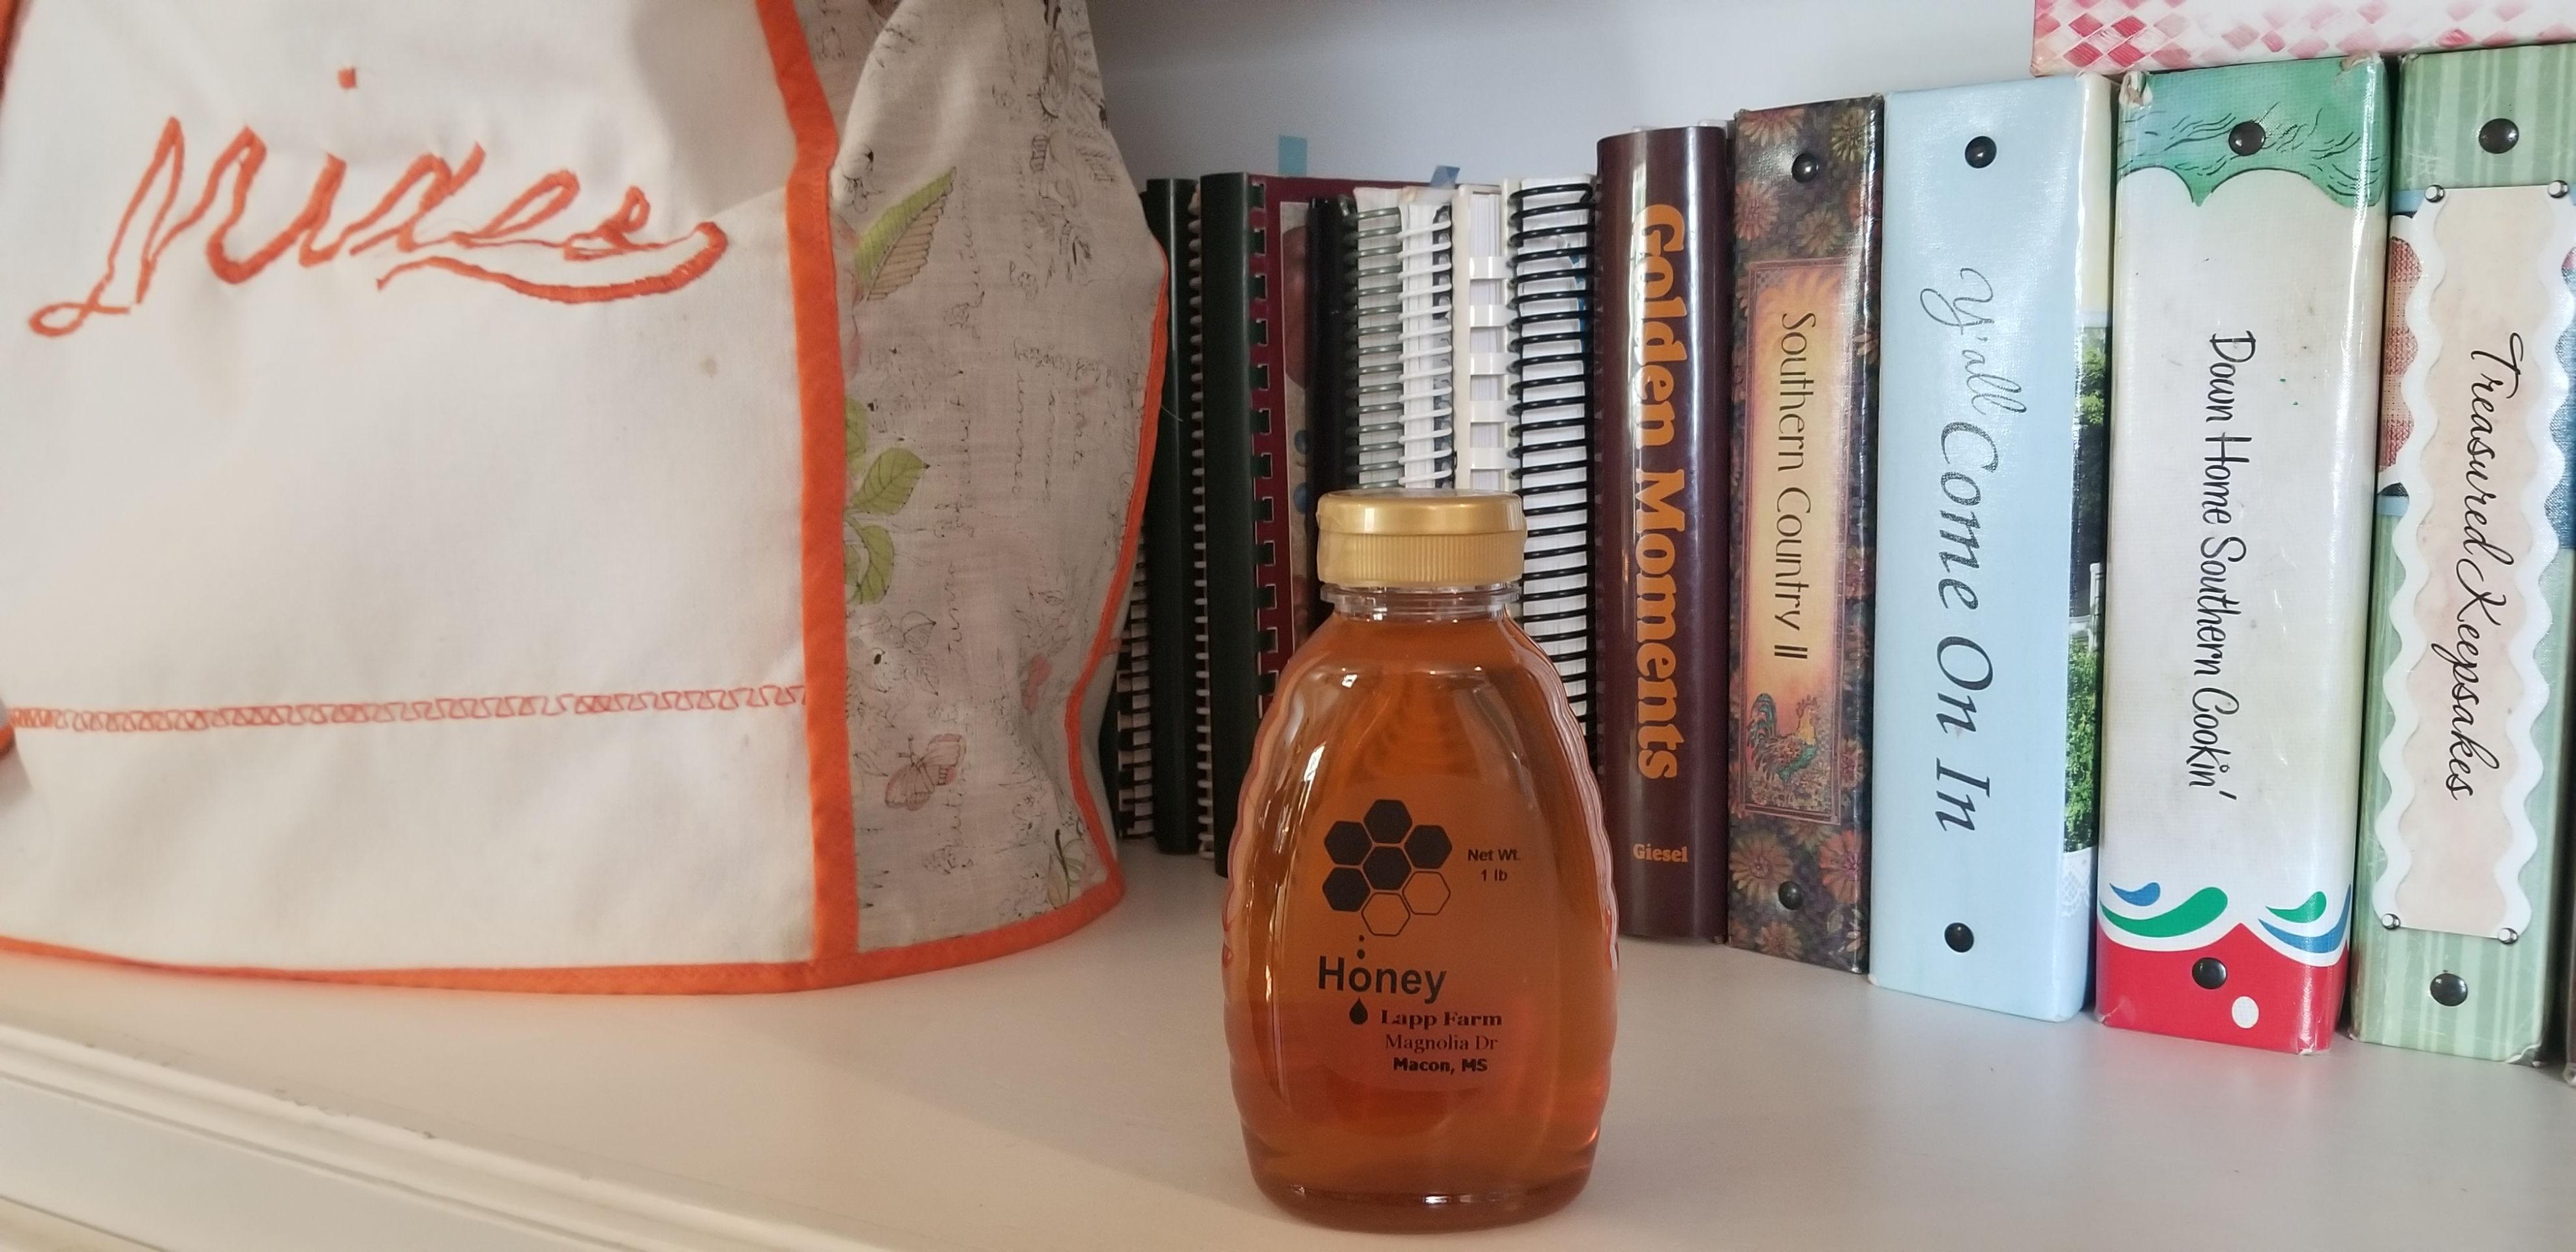 8 oz. Honey (squeeze bottle)